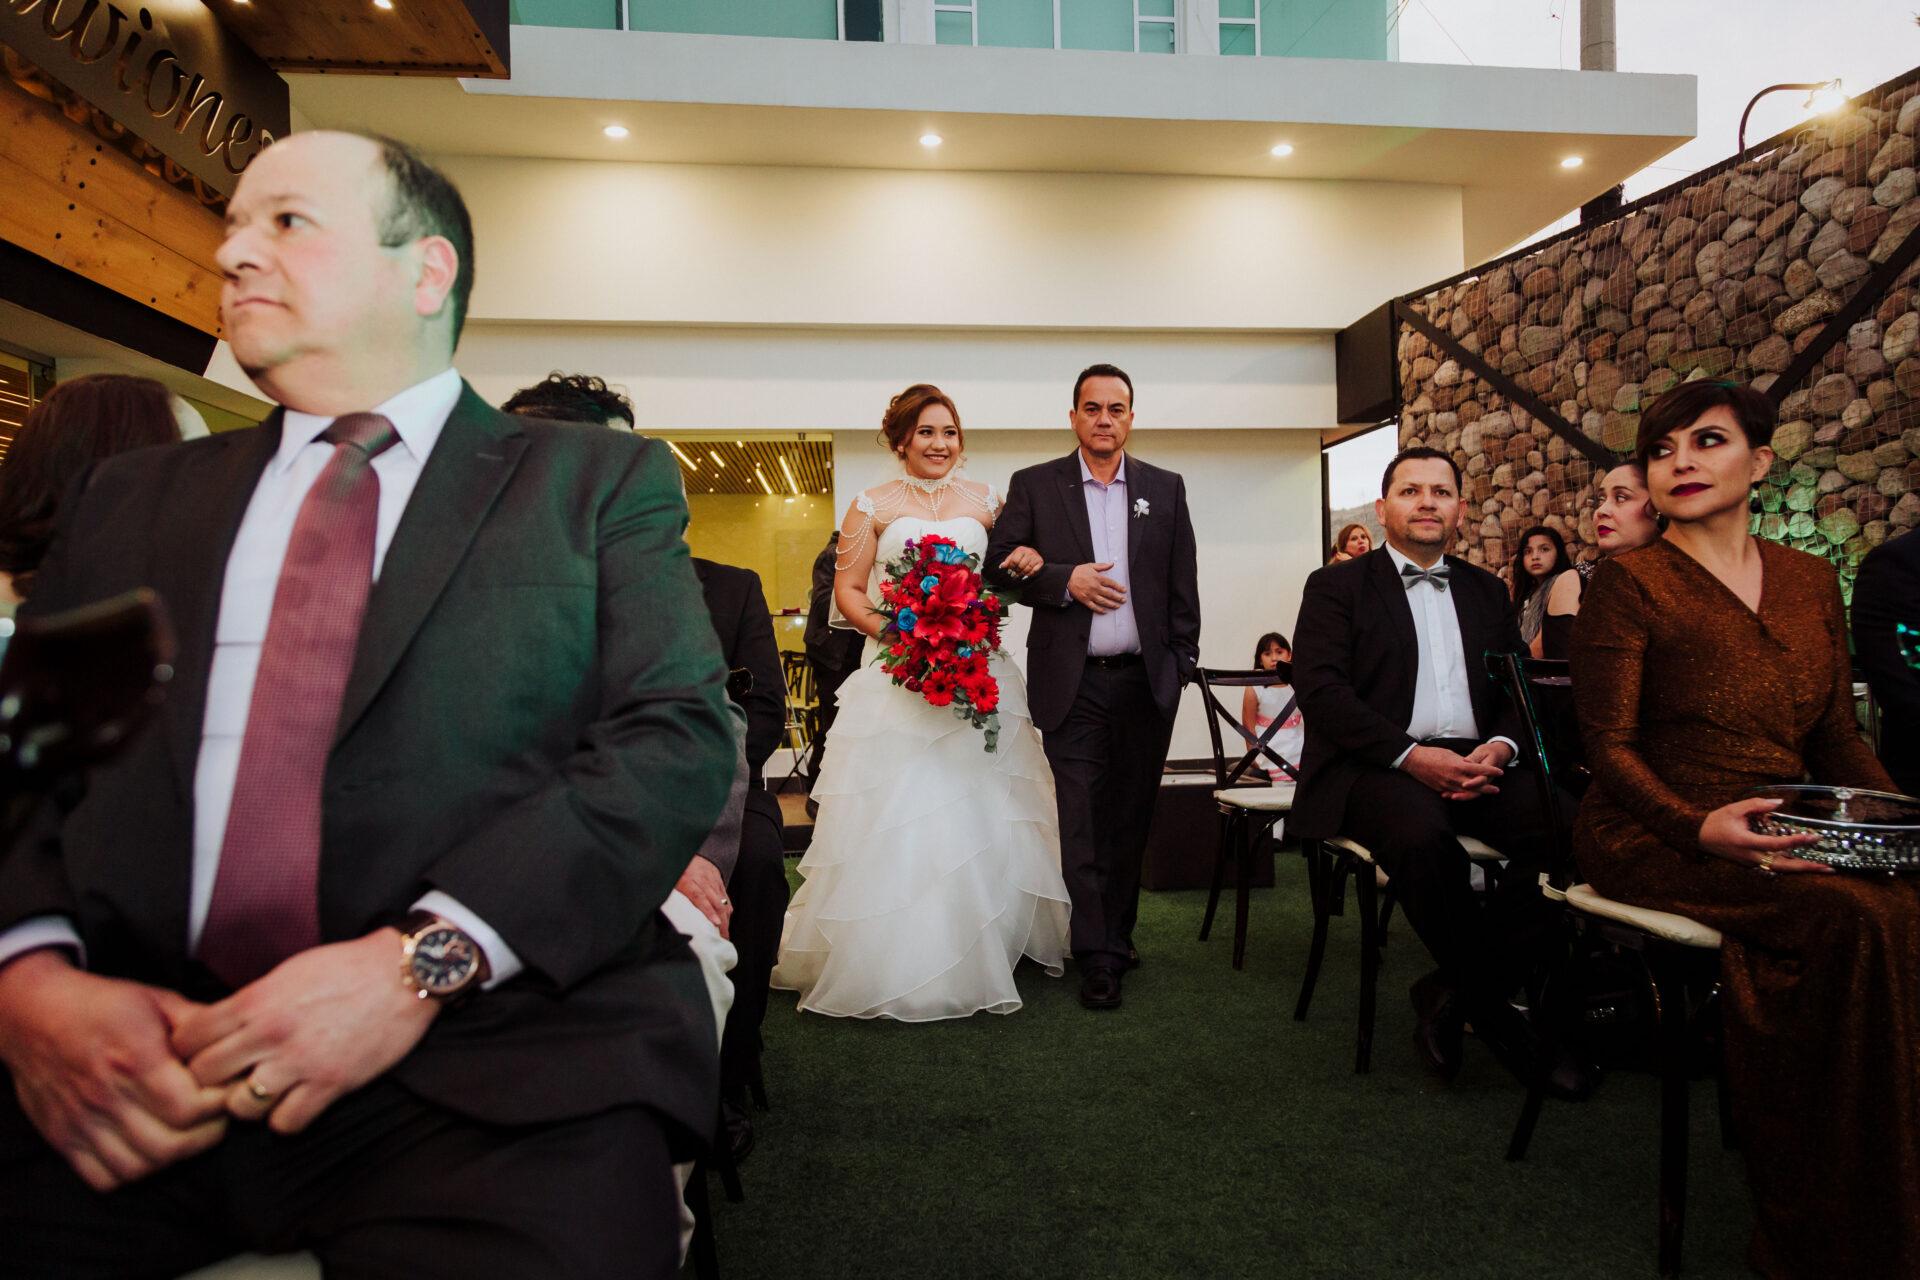 javier_noriega_fotografo_bodas_gaviones_zacatecas_wedding_photographer24